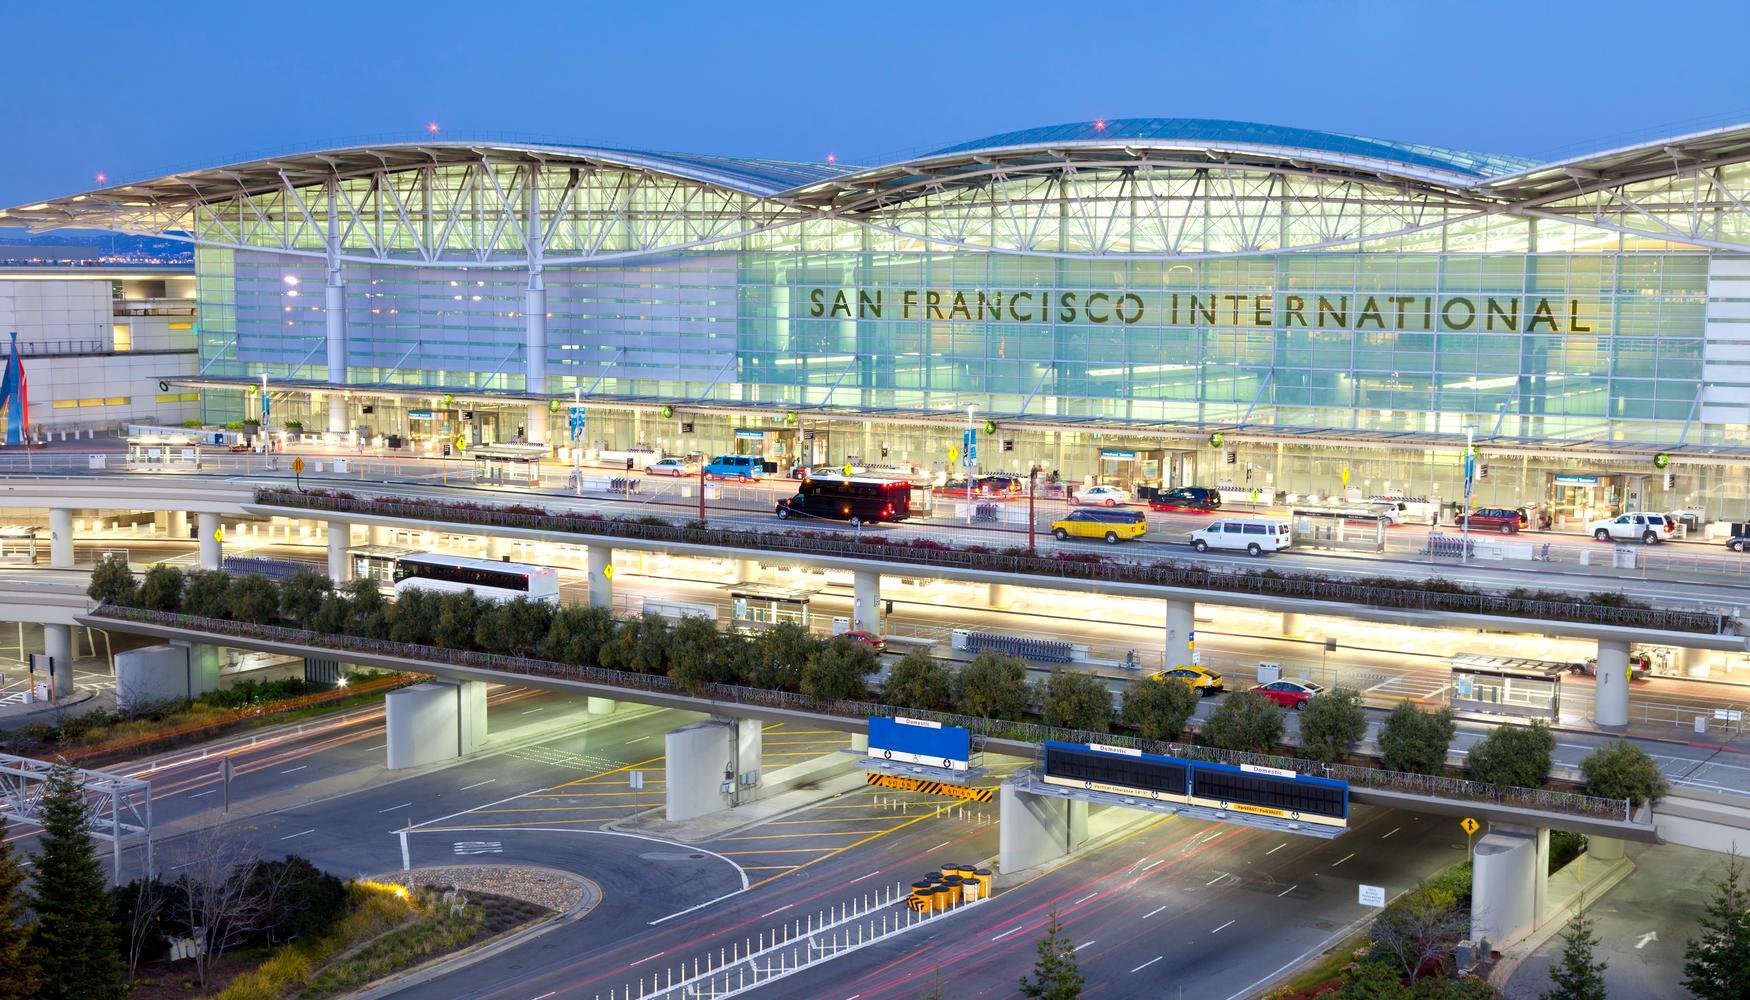 Aluguel de carro em Aeroporto de San Francisco